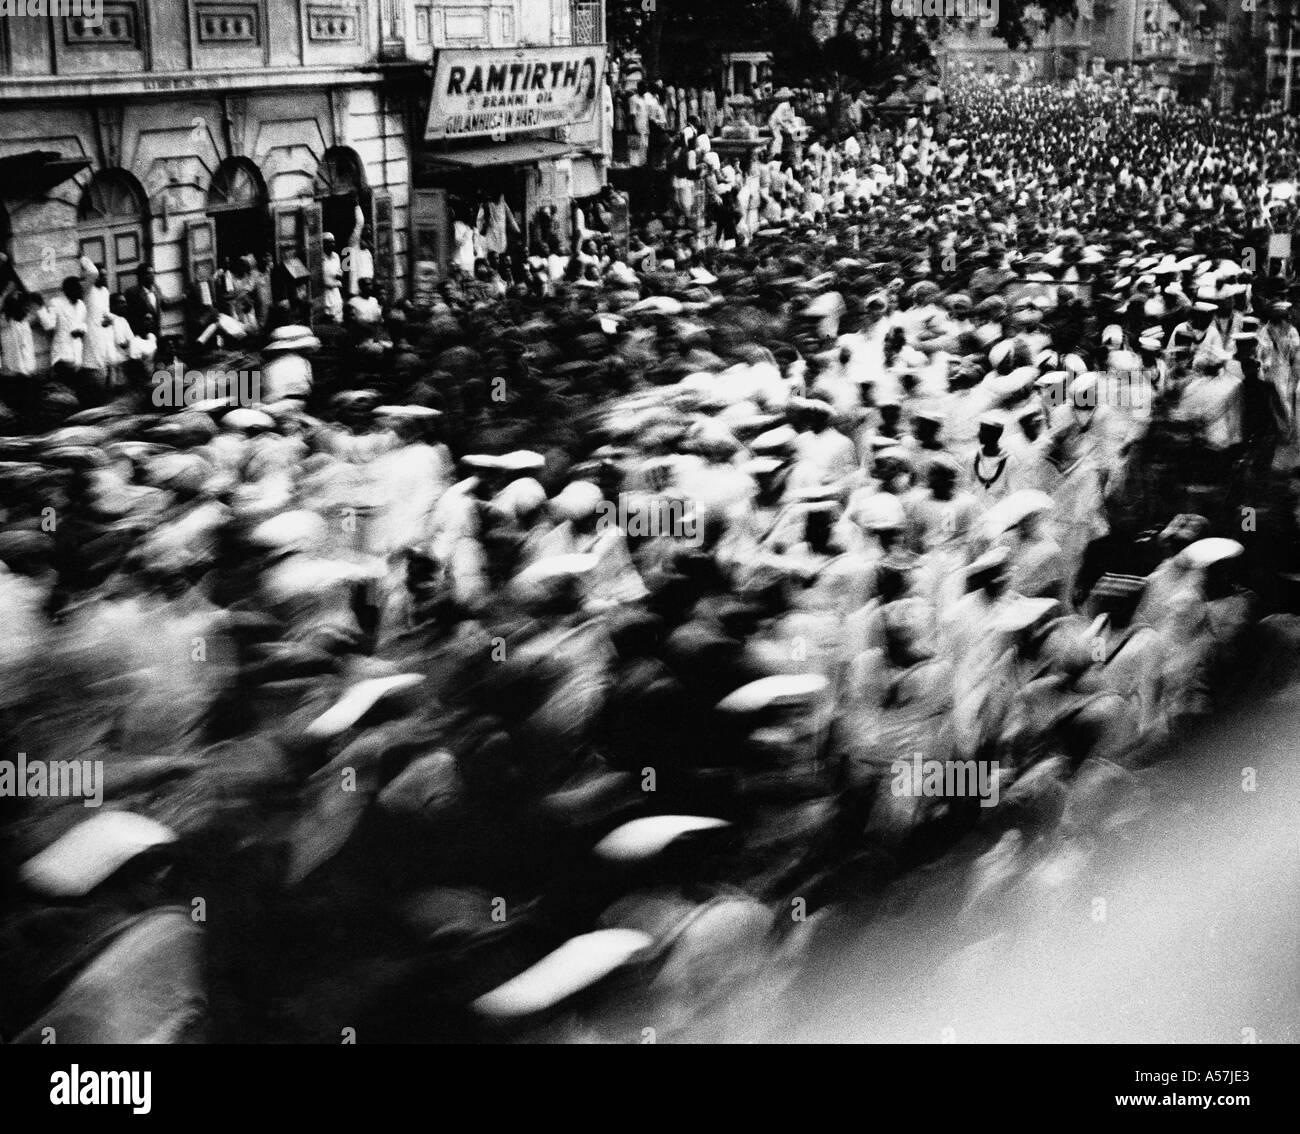 Sardar Vallabhbhai Patel funeral procession crowd at last journey Bombay Mumbai Maharashtra India 15 December 1950 - Stock Image